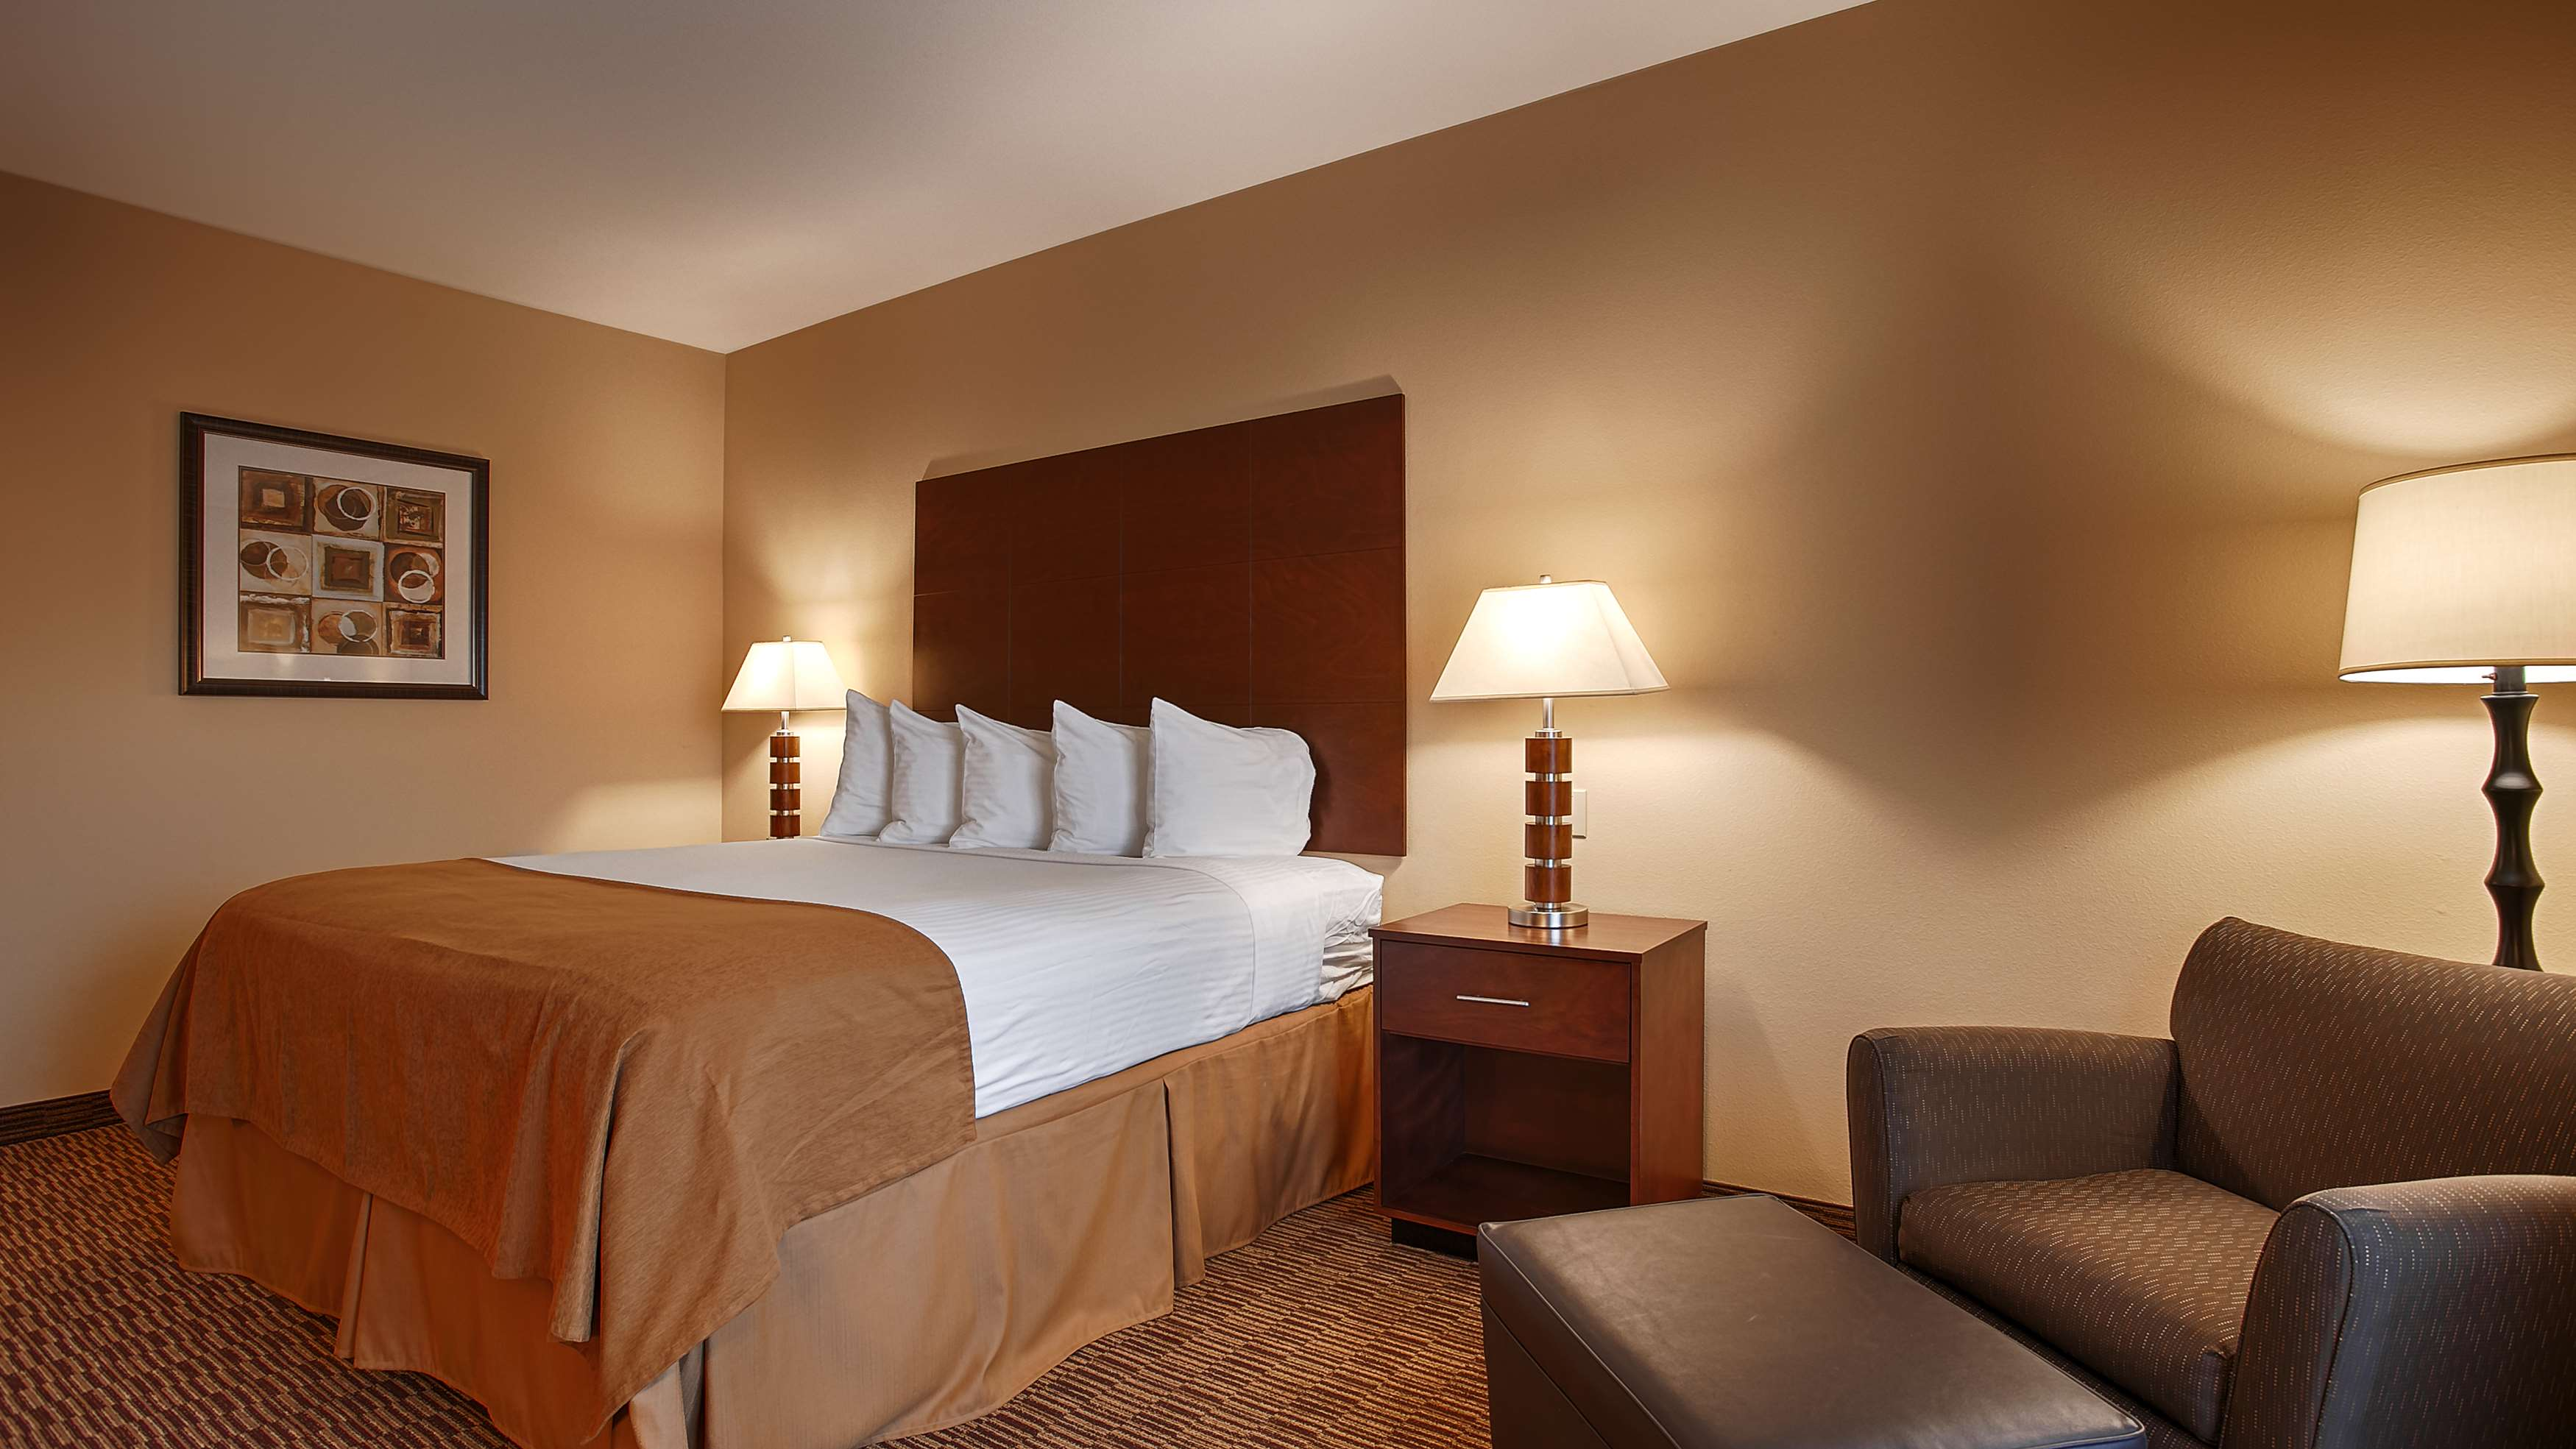 Best Western St. Francisville Hotel image 12